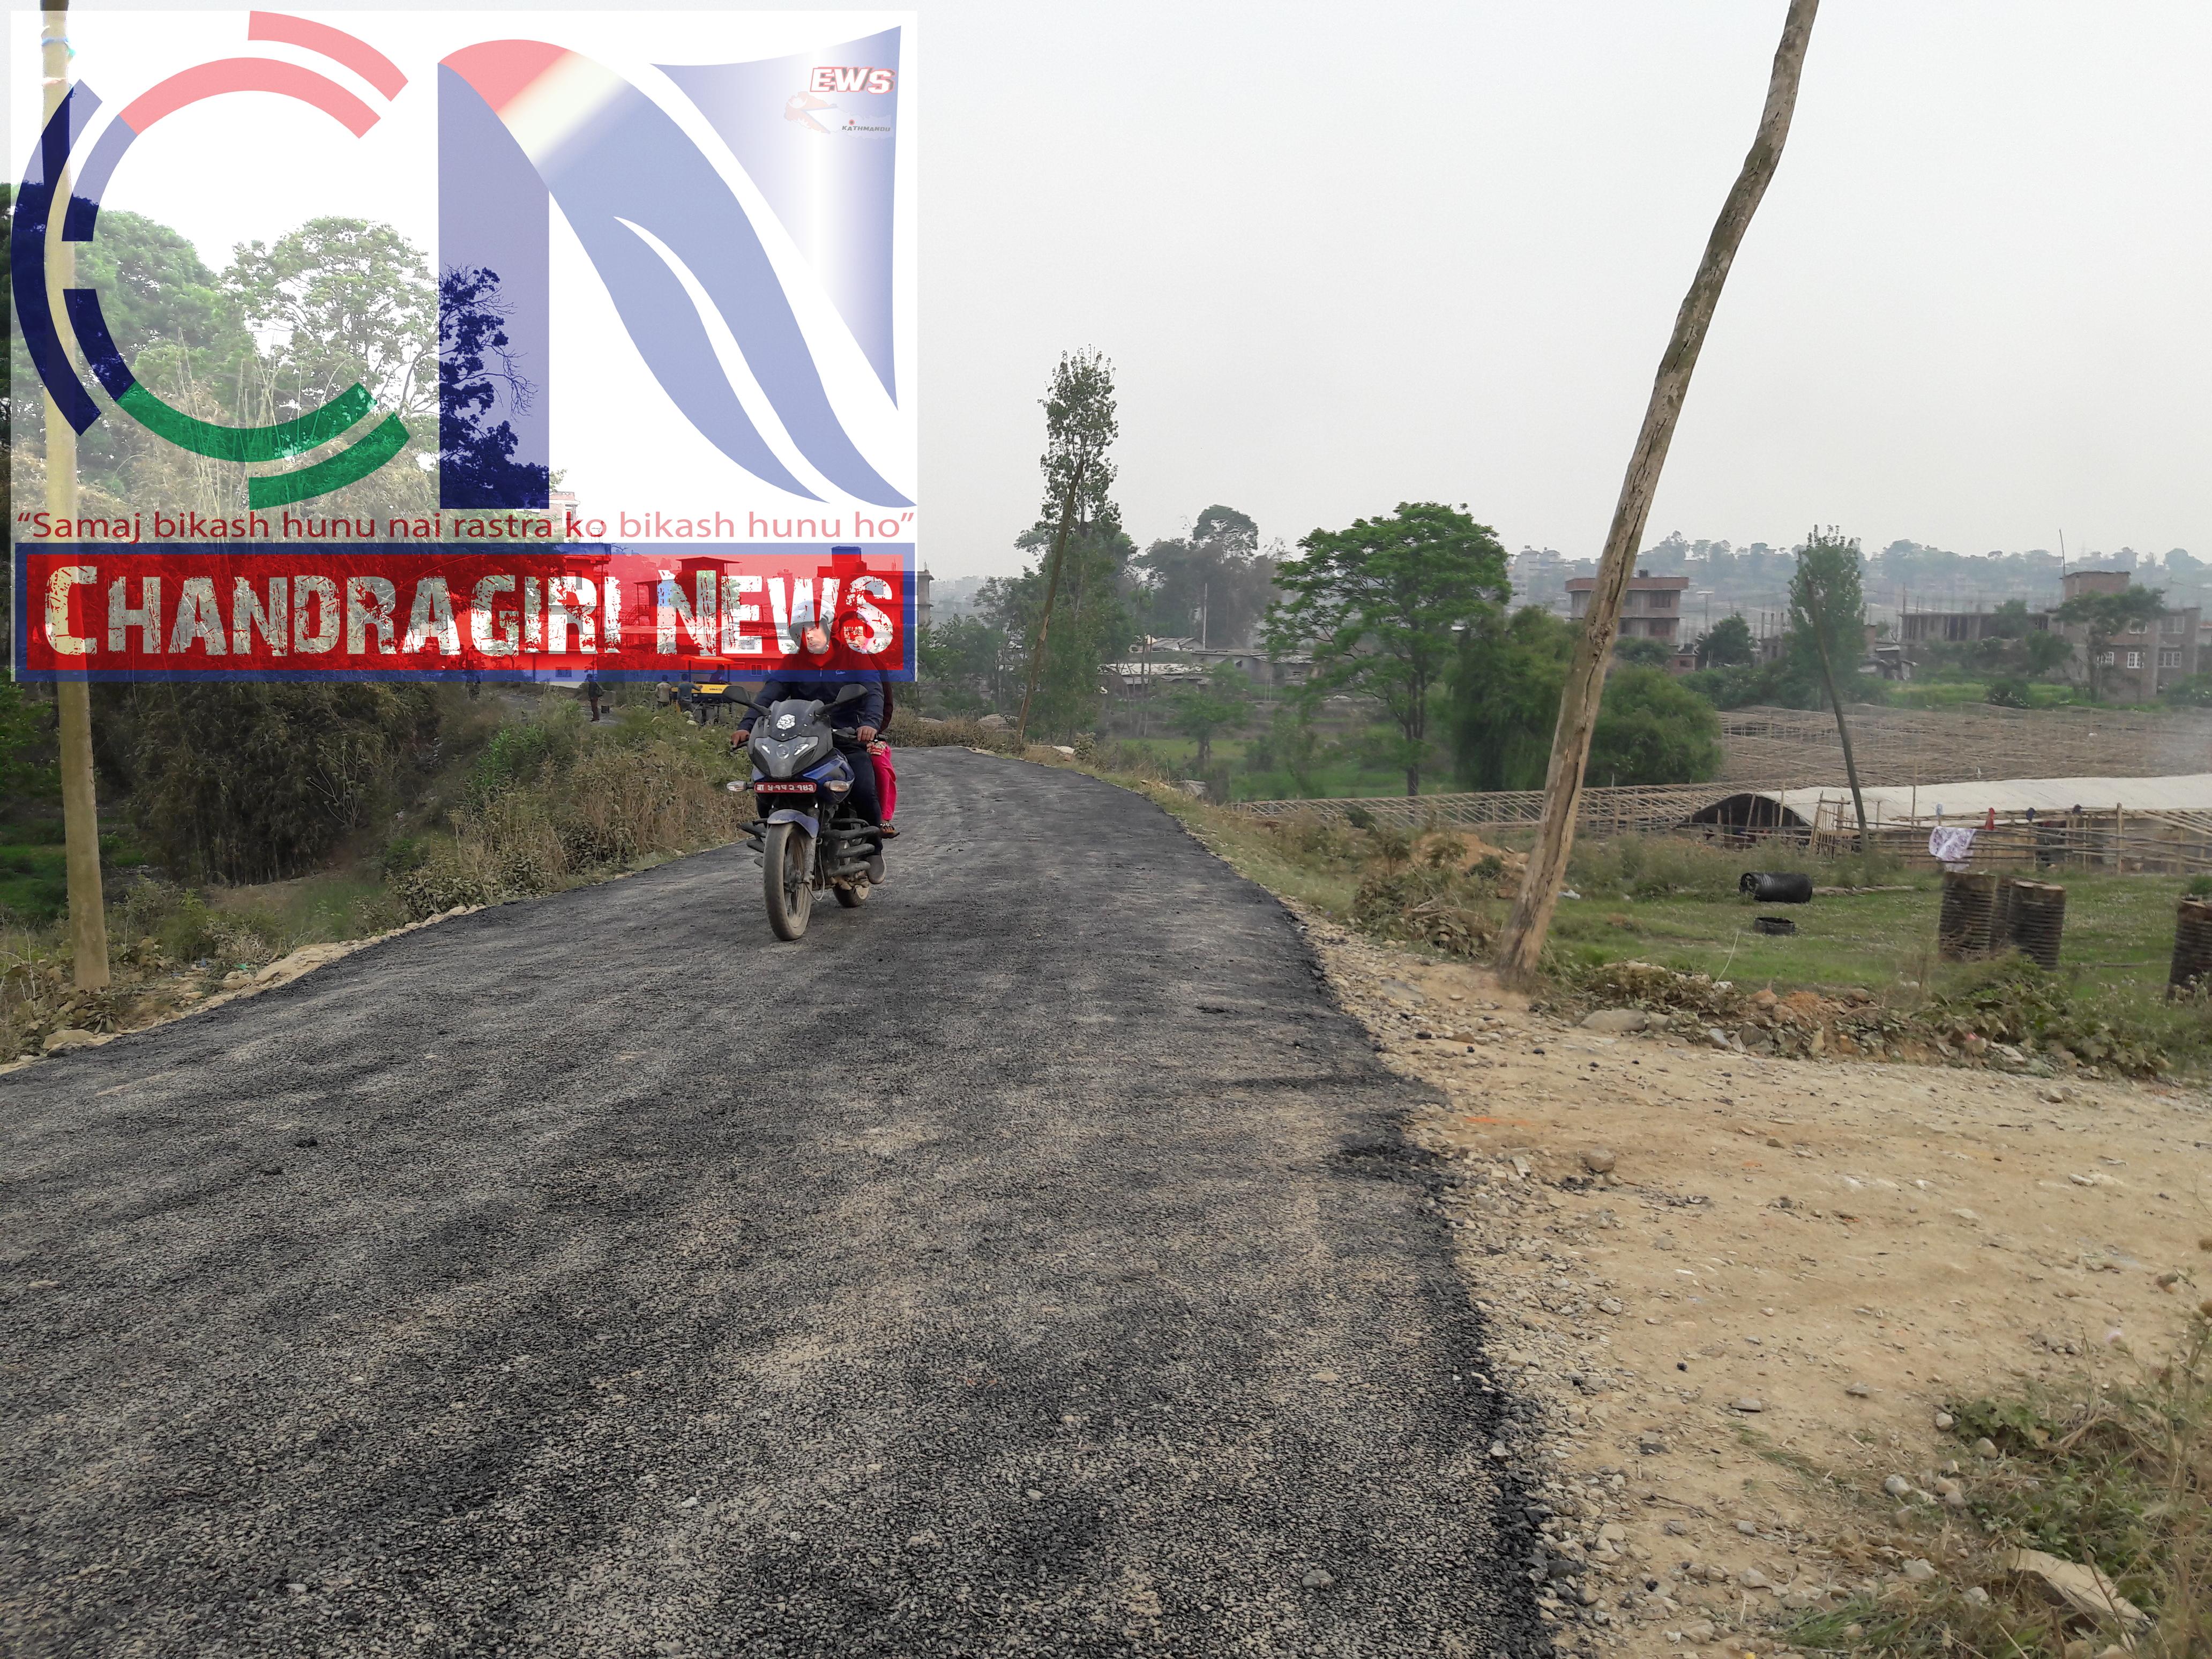 Chandragirinews 20170414_1445531 विष्णुदेवी - विन्ध्यावासिनी सडक खण्ड निर्माण कार्य सुरु तीनथाना बोसिंगाउँ मछेगाउँ समाज    chandragiri, chandragiri news, chandragiri hills, chandragiri cabel car, thankot, satungal, naikap, balambu, matatirtha